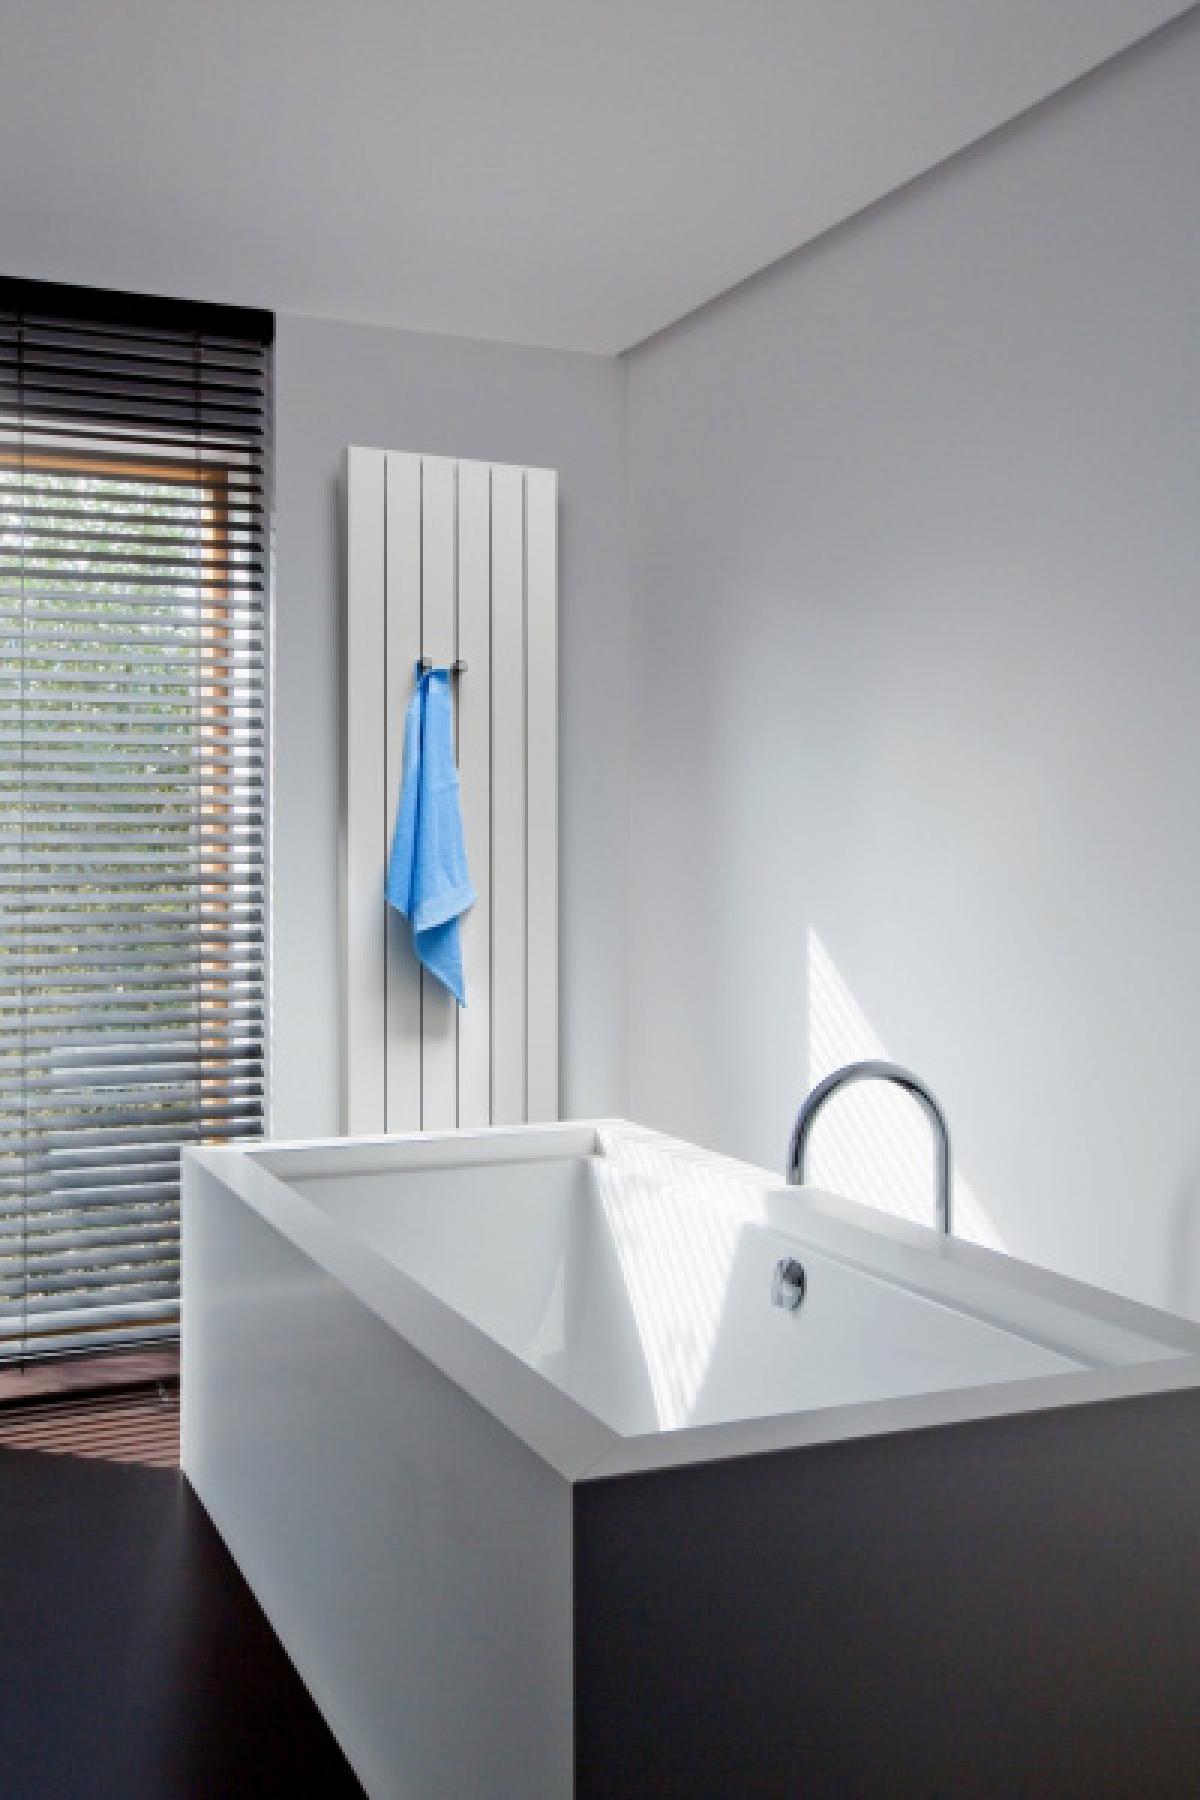 radiateur zaros vertical vasco induscabel salle de. Black Bedroom Furniture Sets. Home Design Ideas